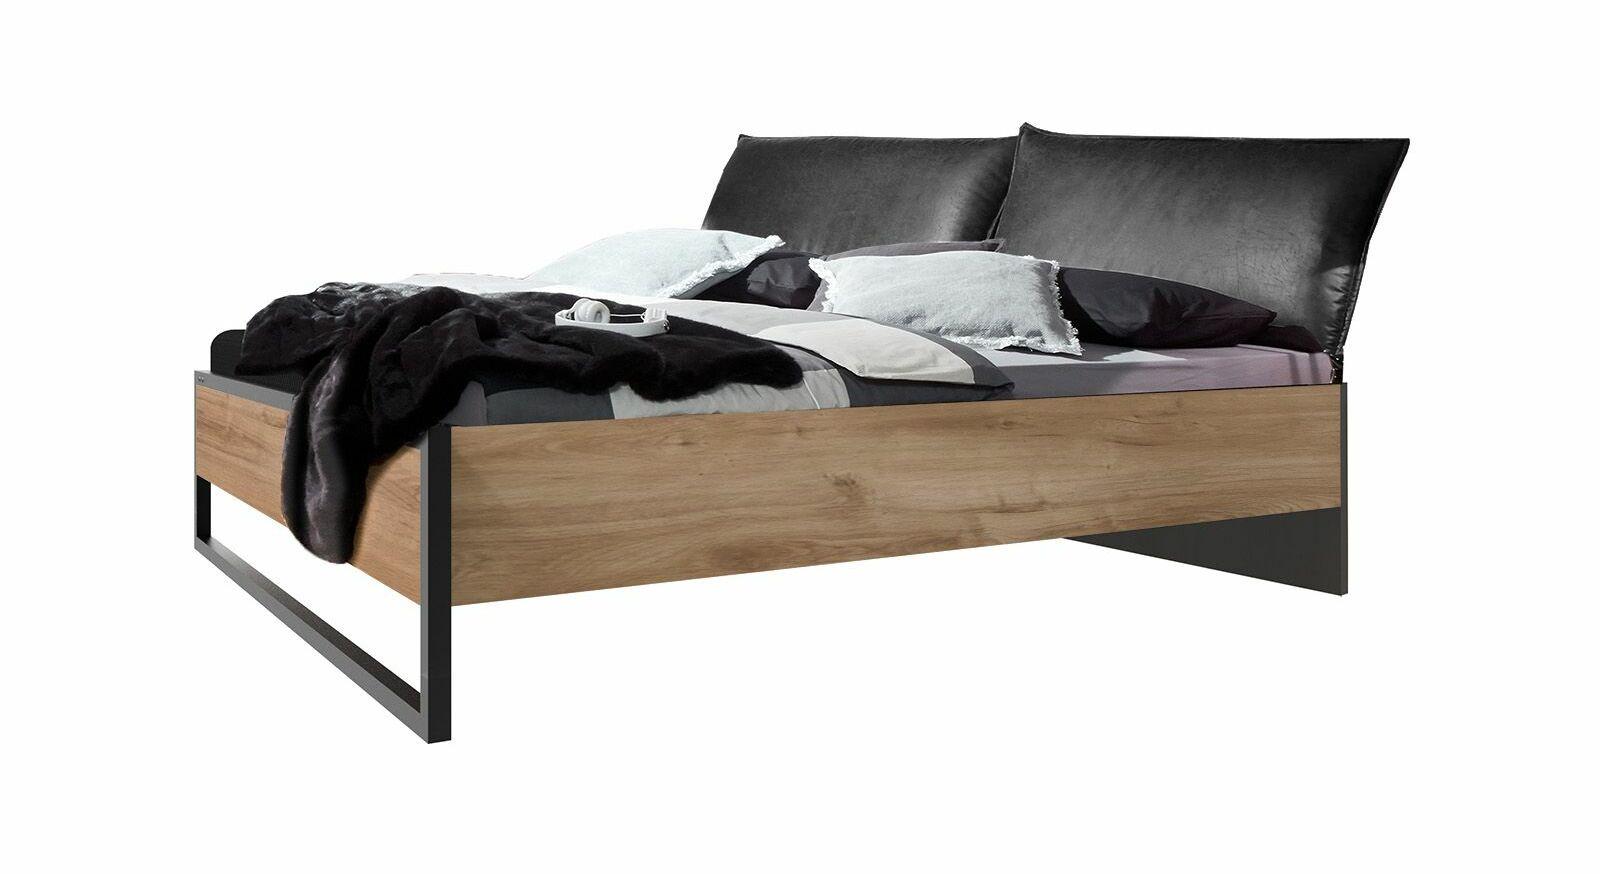 Preiswertes Bett Mancos im Factory-Style